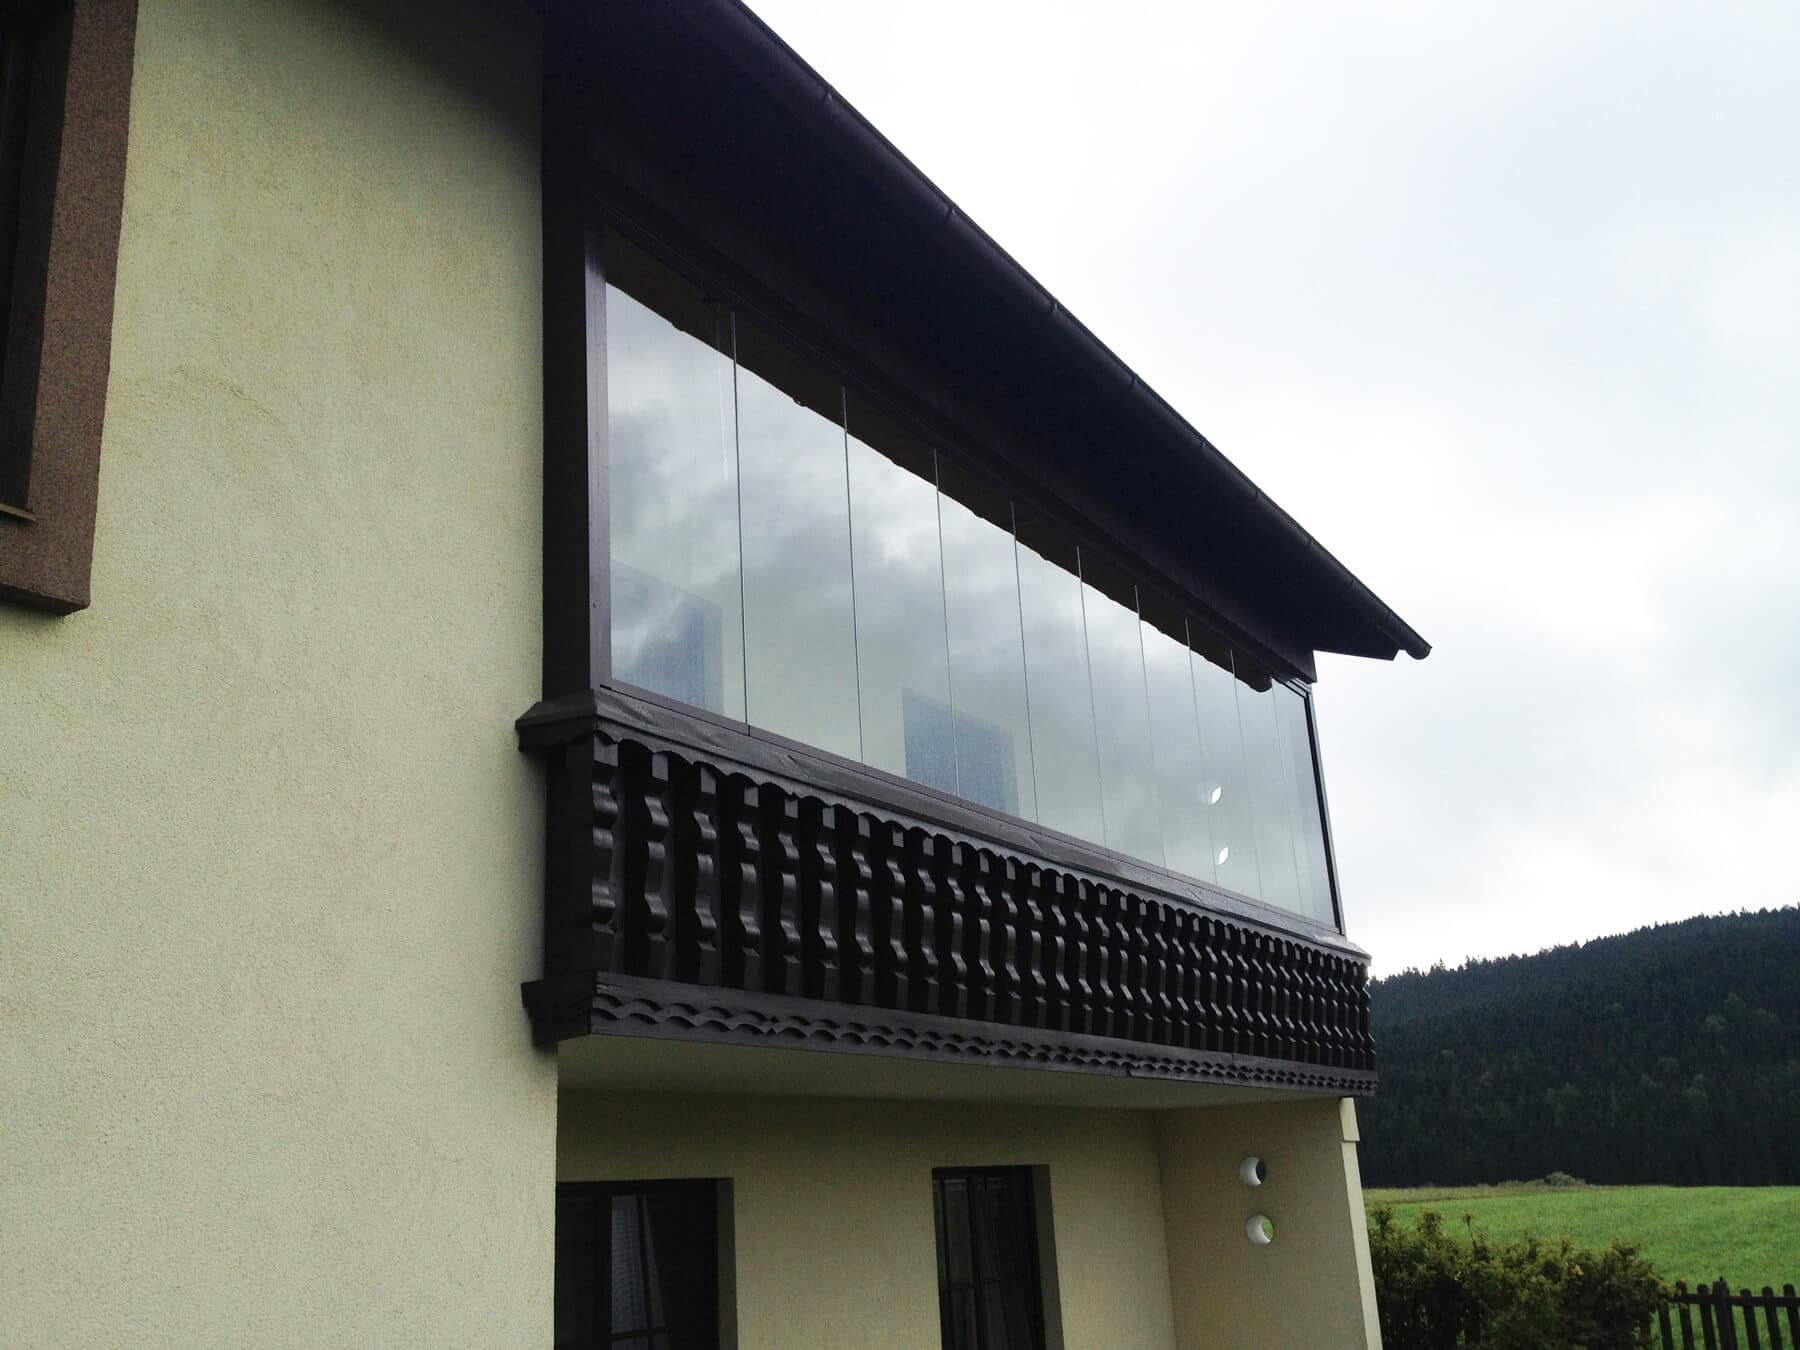 Balkonverglasung zum Falten